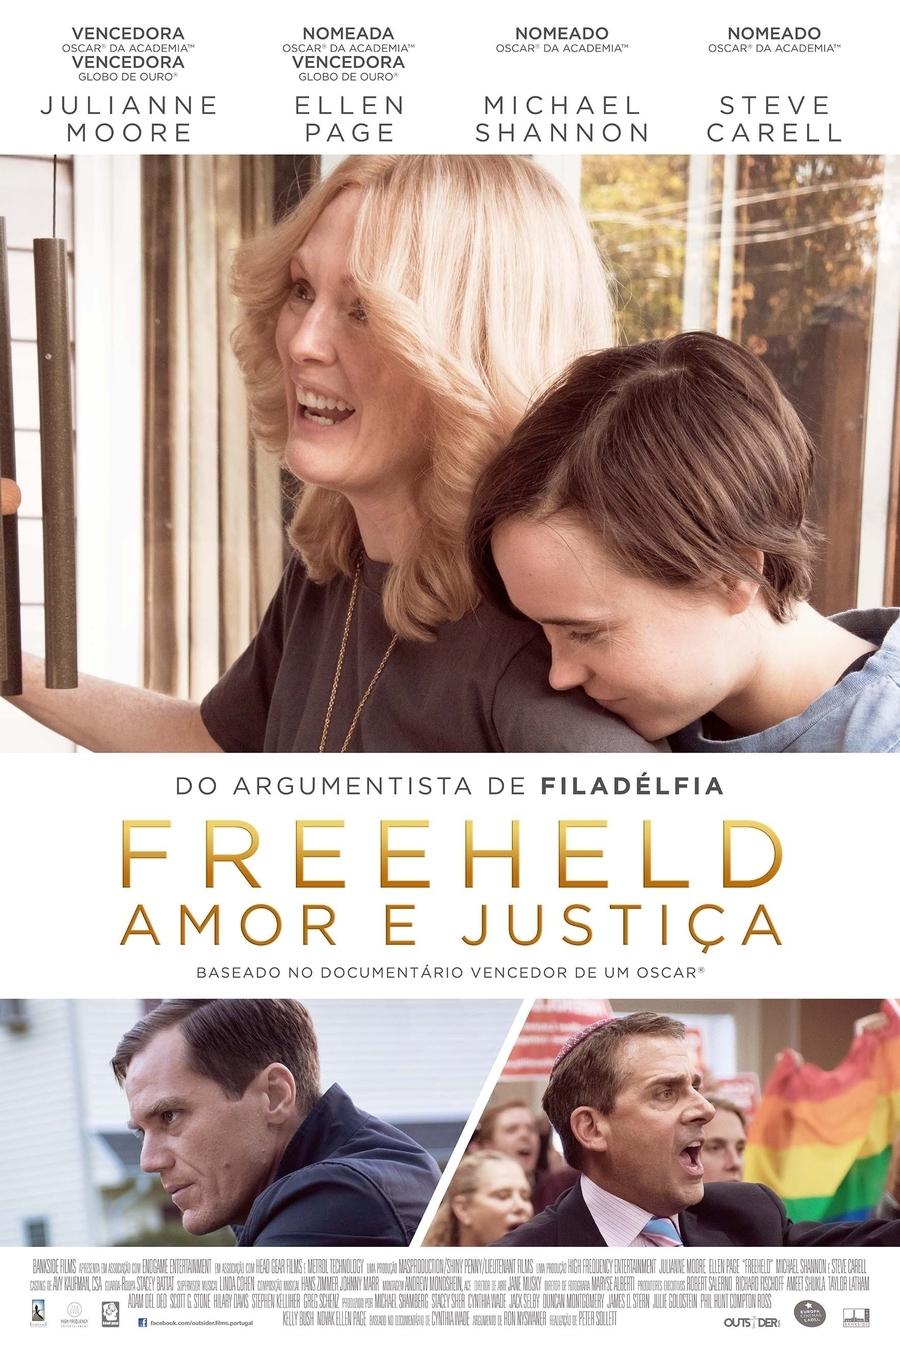 Freeheld - Amor e Justiça